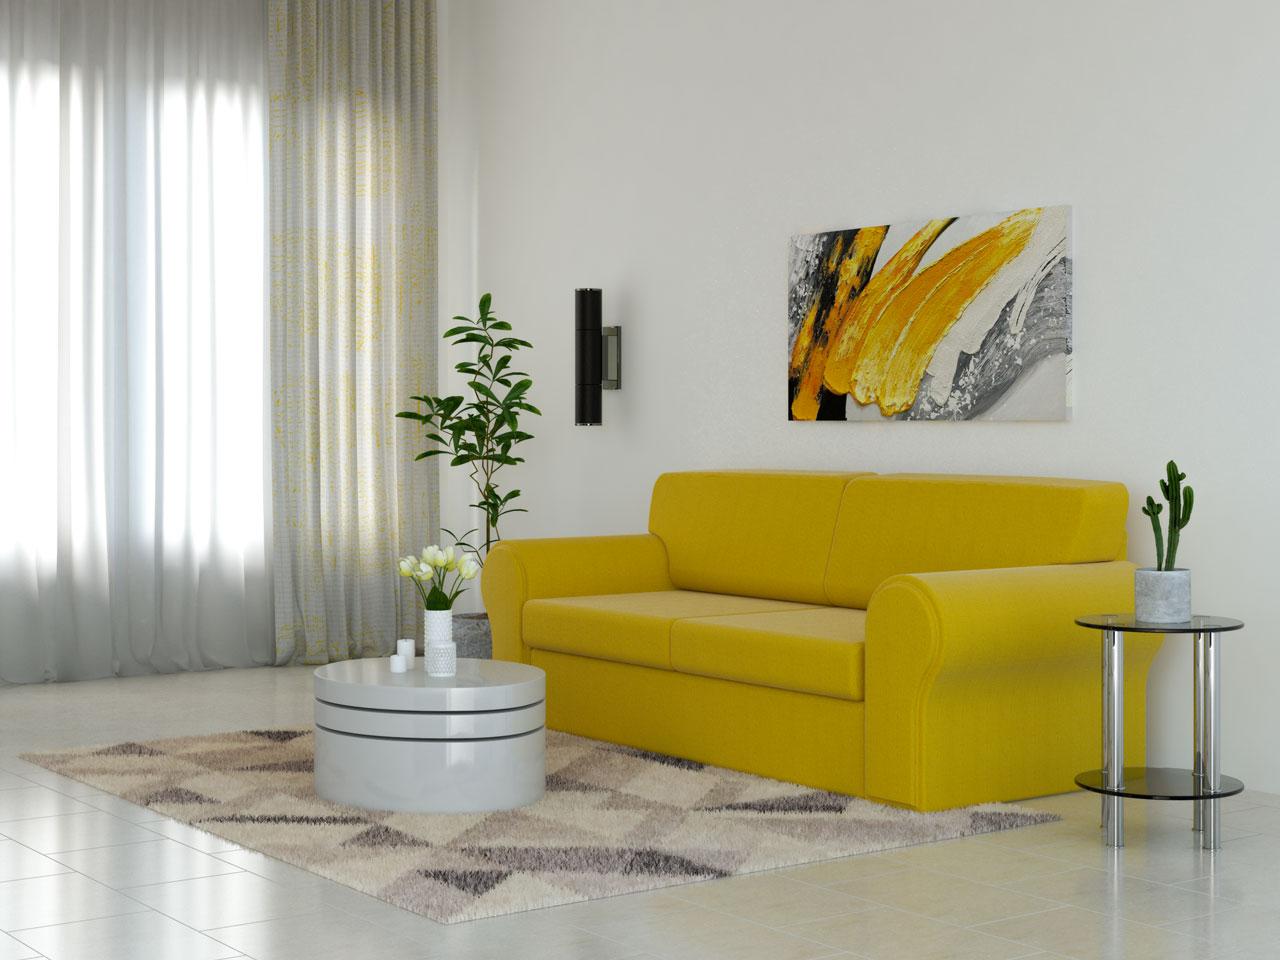 Beige rug with yellow sofa